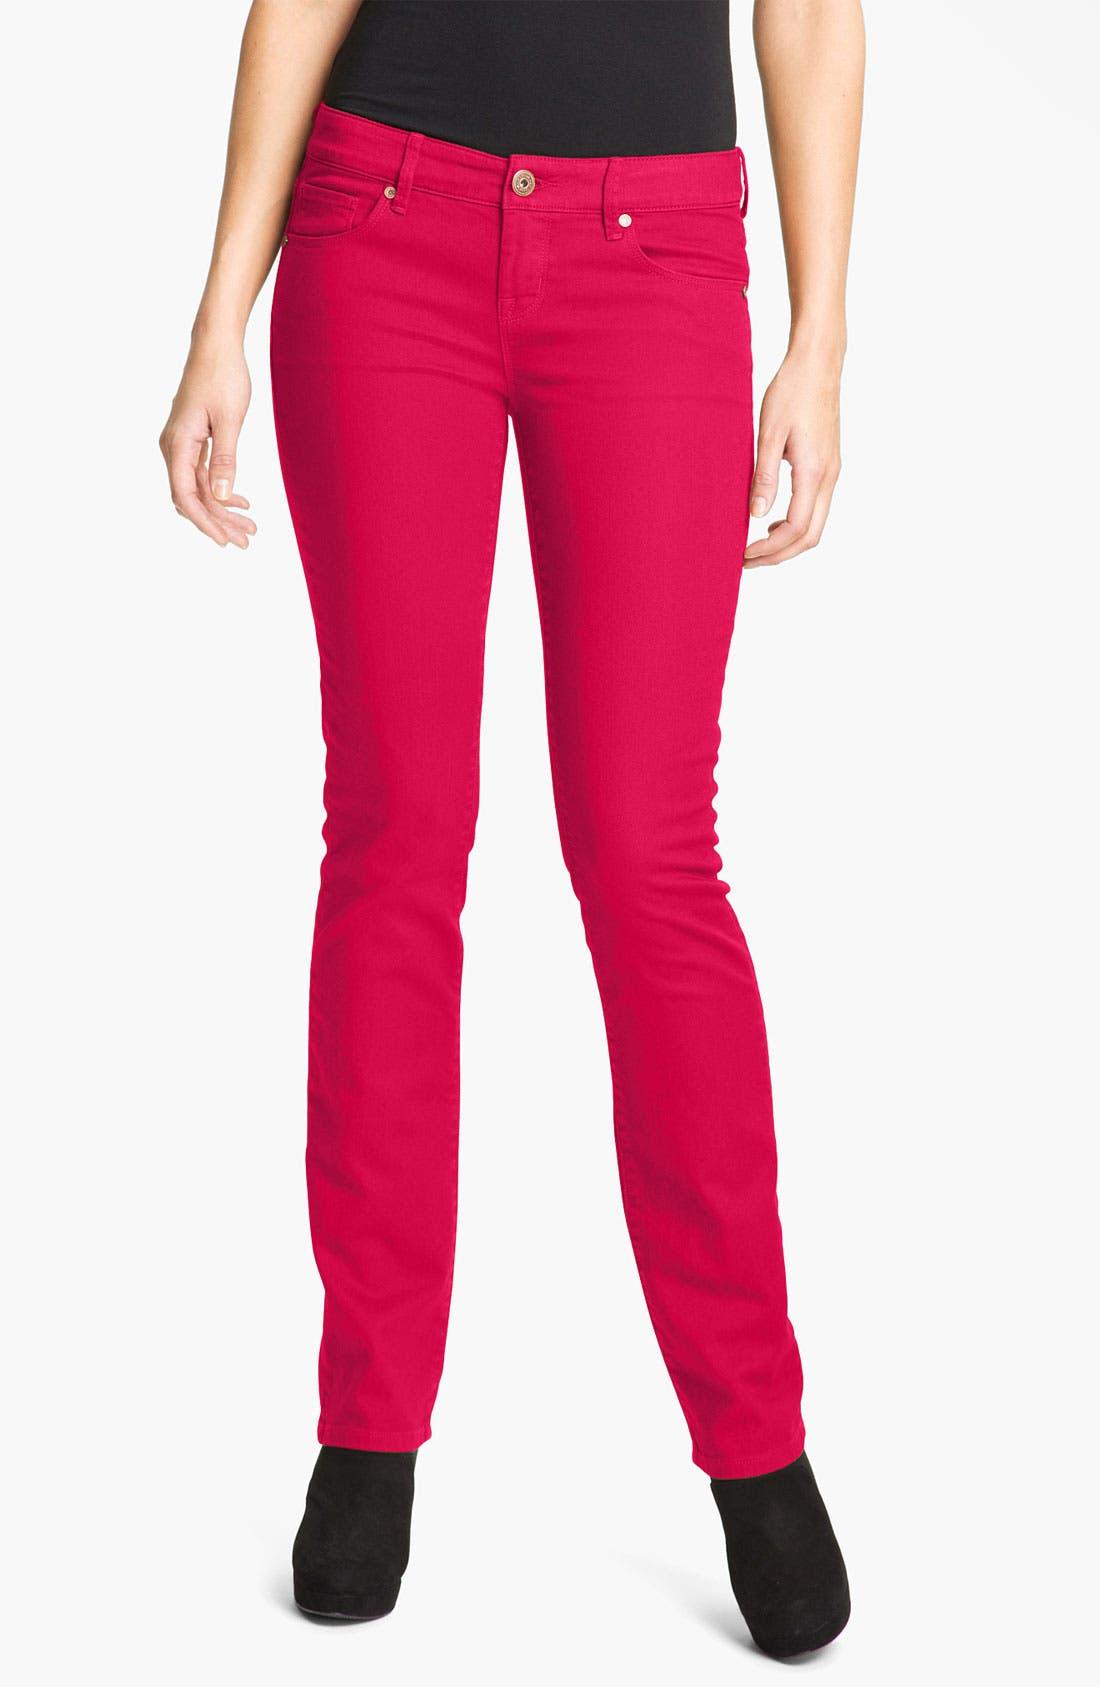 Main Image - Isaac Mizrahi Jeans 'Emma' Straight Leg Jeans